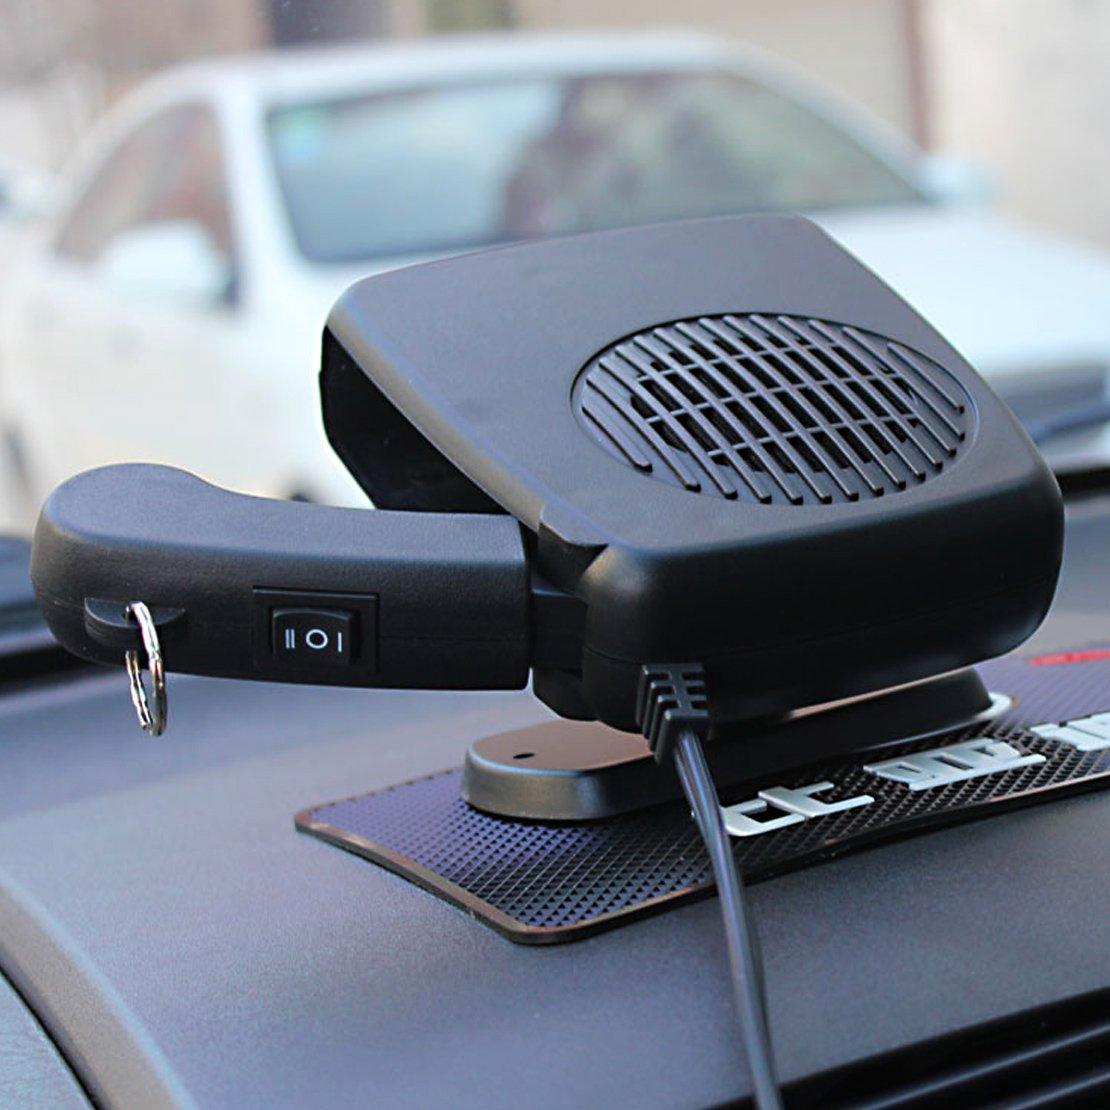 beler Universal Car 2 in 1 12V Portable Dryer Heater Fan Defroster Demister Windshield Heating Cooling Air Blower hermeshine